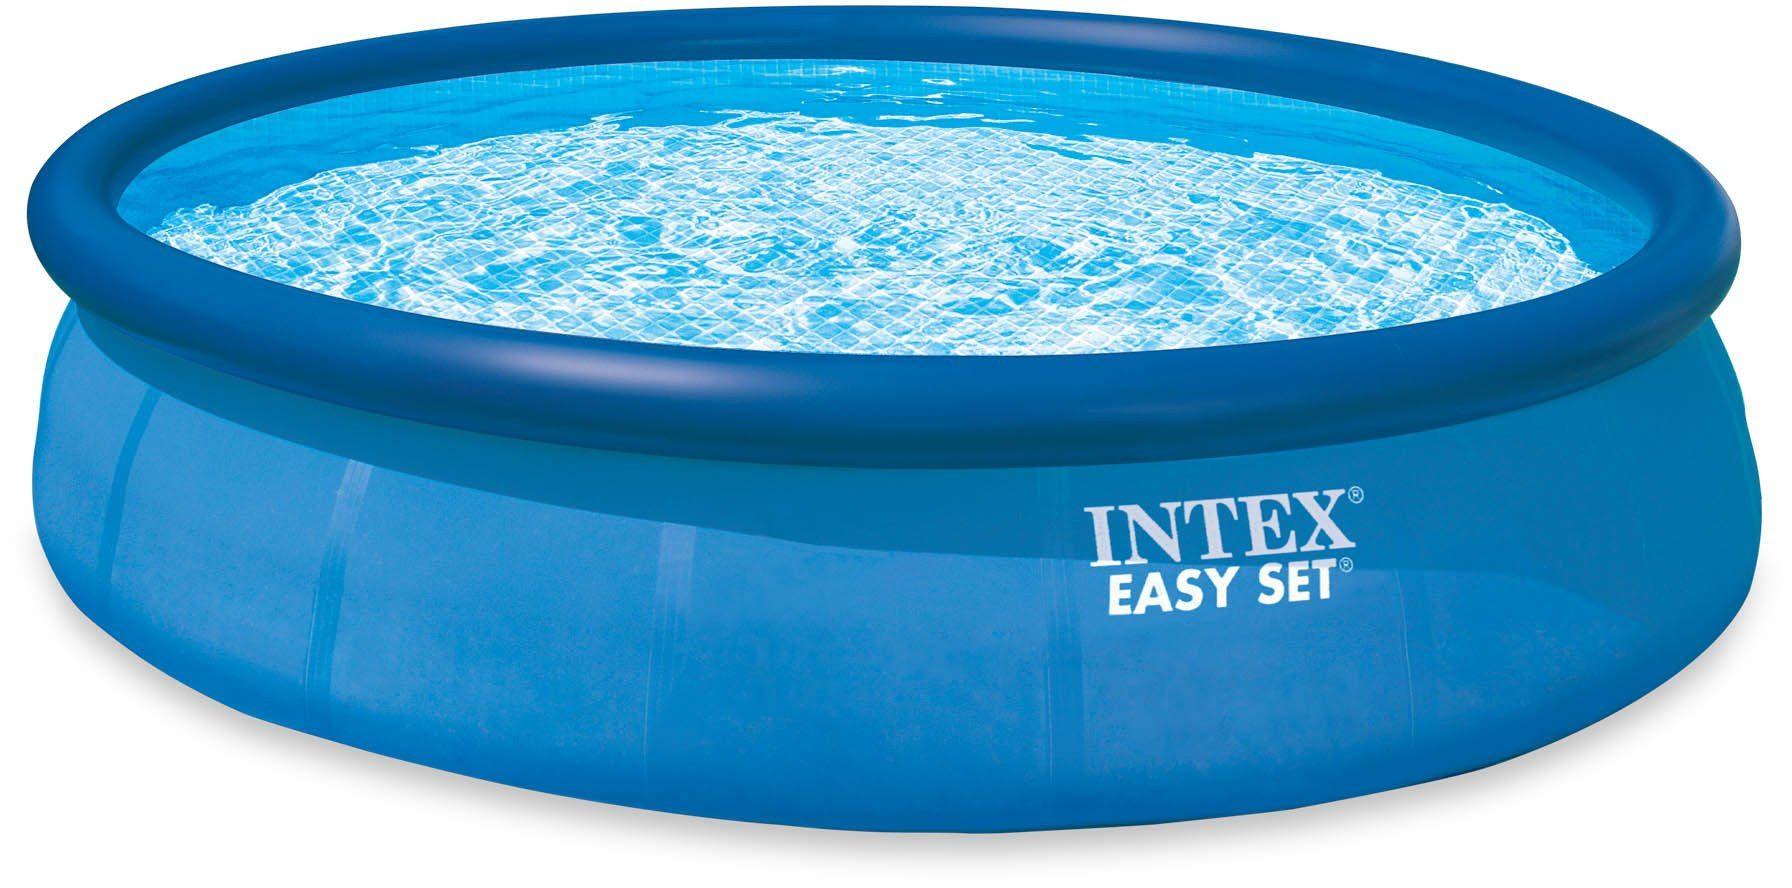 Intex Pool-Set, mit Kartuschenfilteranlage, Ø 457 cm, »Easy Set Pool-Komplettset«